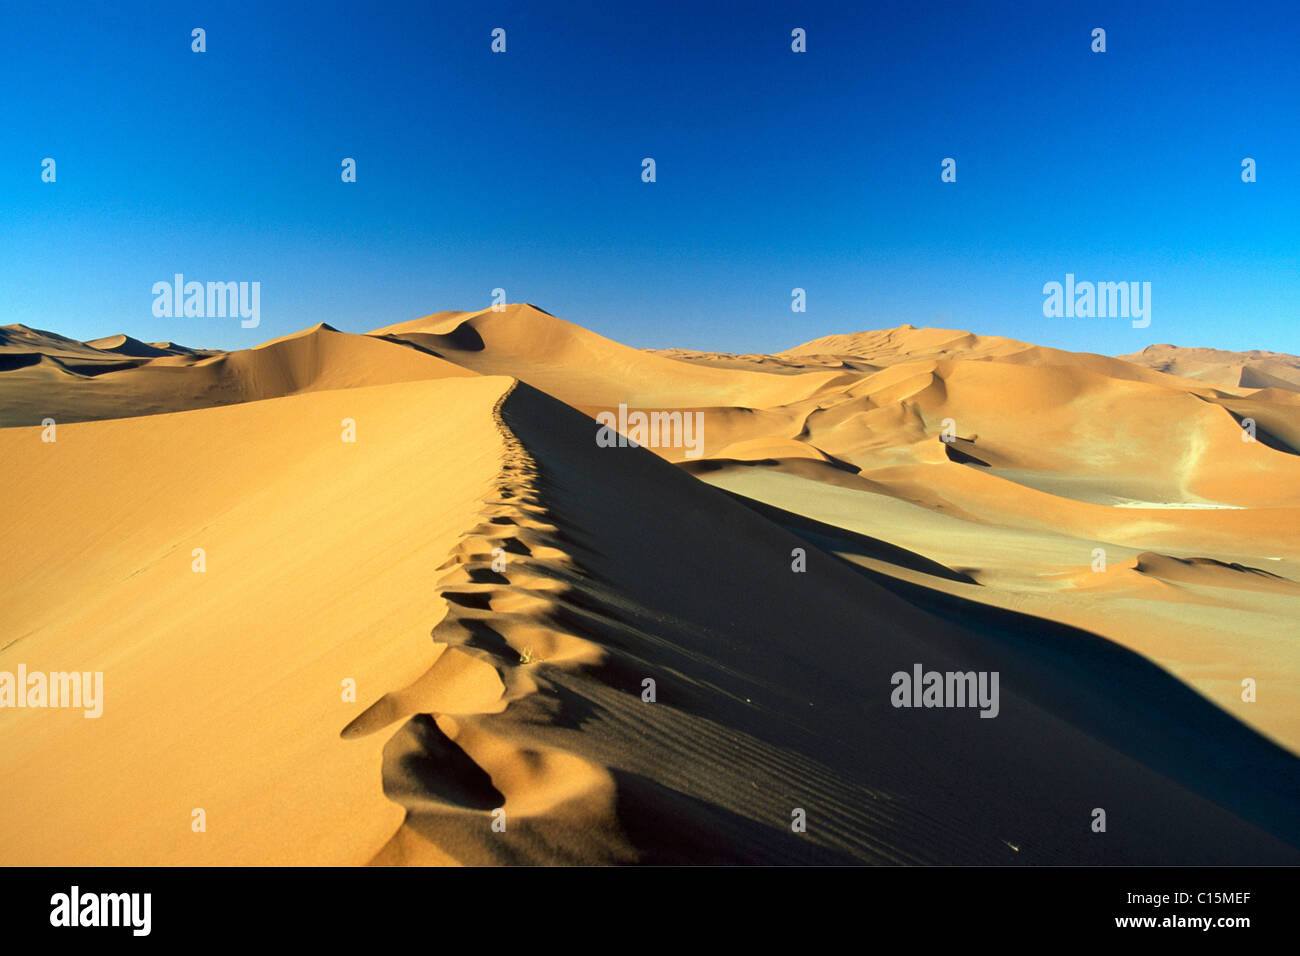 Paysage de dunes, Sossusvlei, Namib-Naukluft National Park, Désert du Namib, Namibie, Afrique Photo Stock